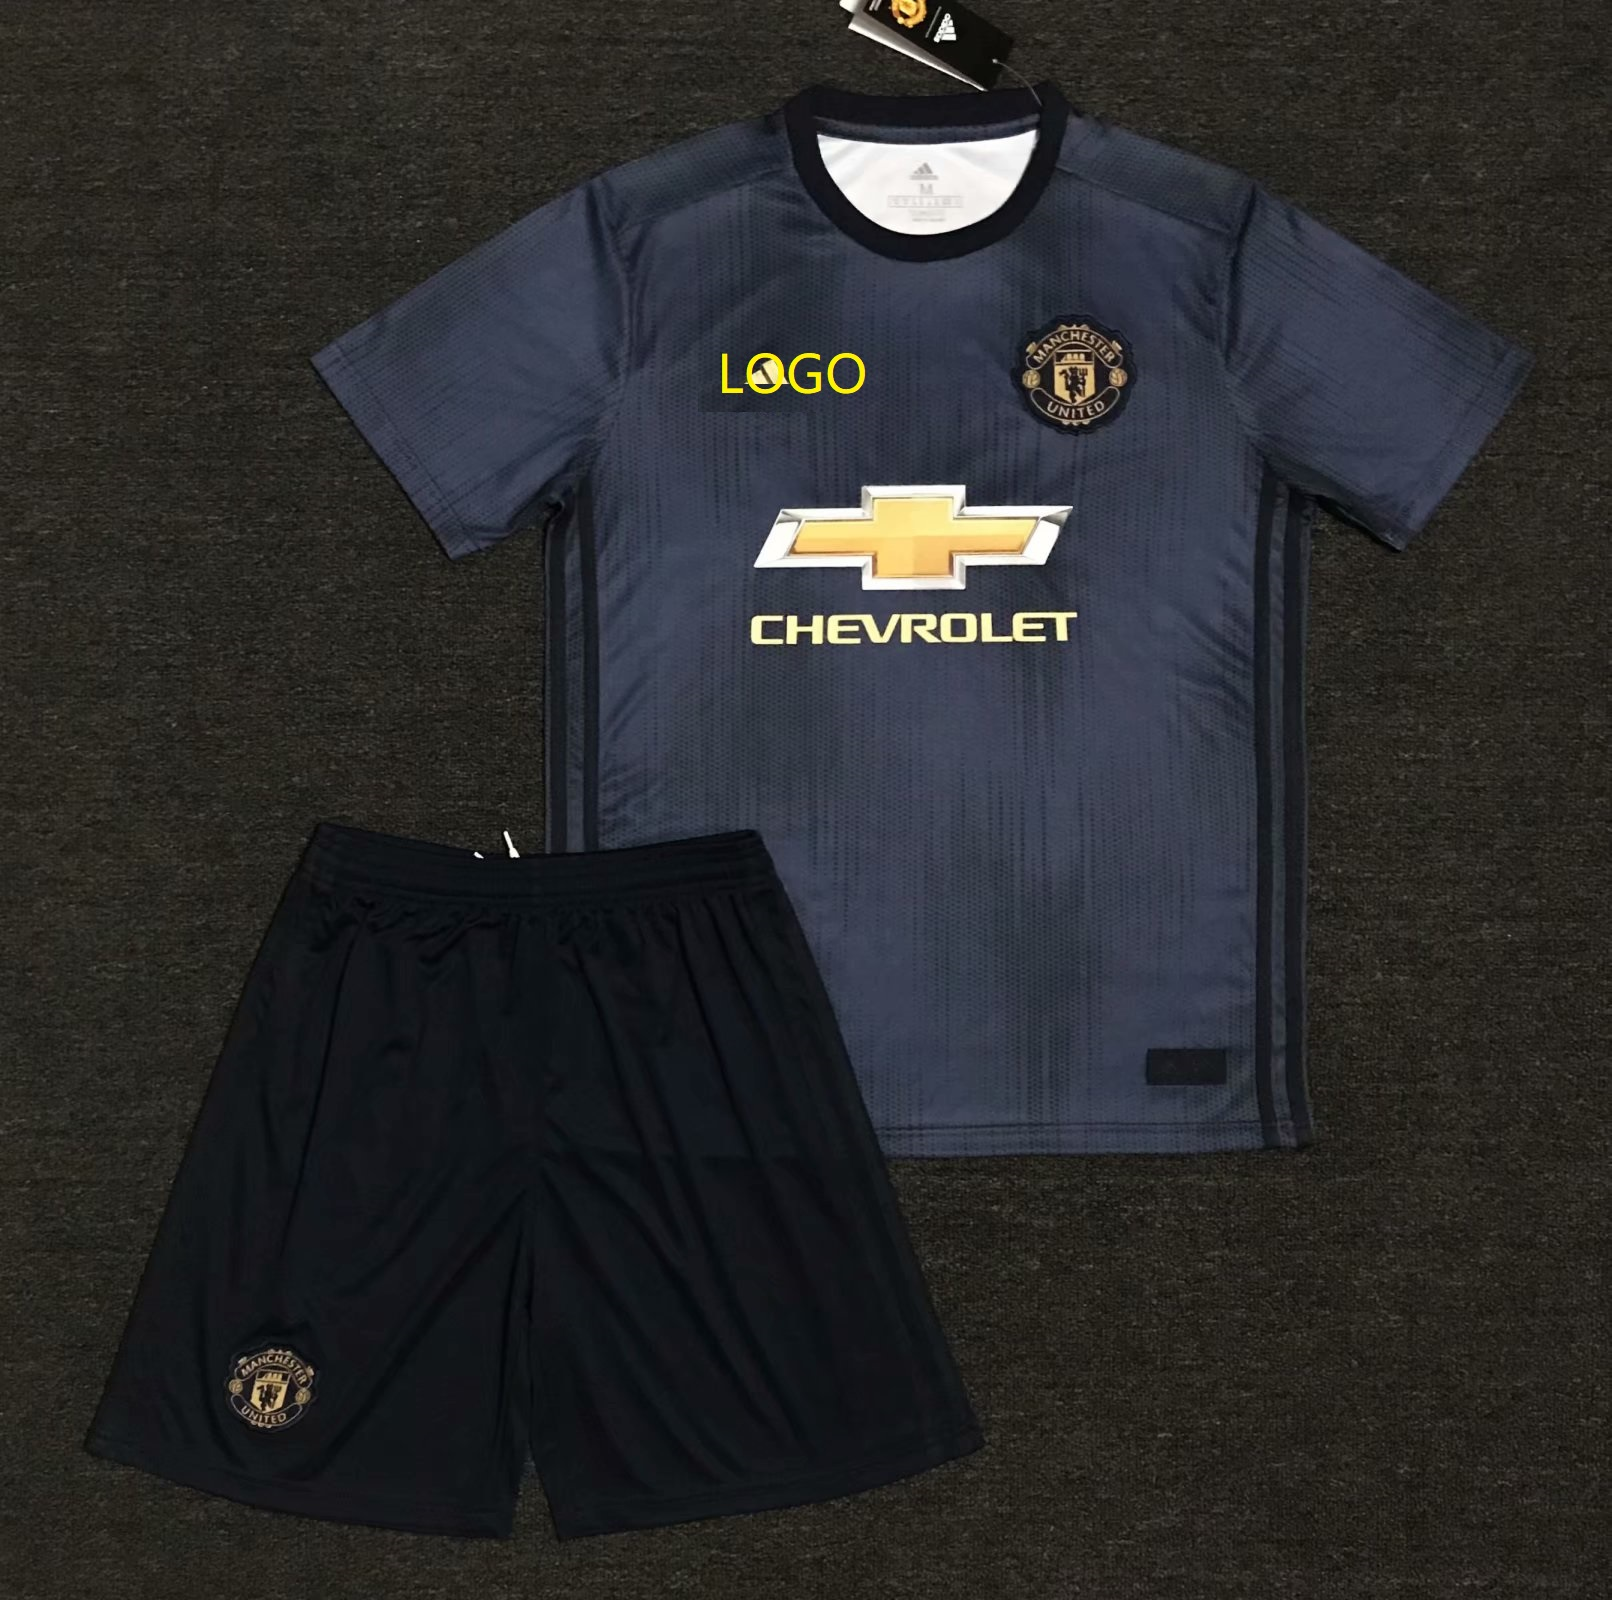 18 19 Cheap Adult Manchester United Away Soccer Jersey Uniform Men Football  Jersey Kits Item NO  521484 1c9506639